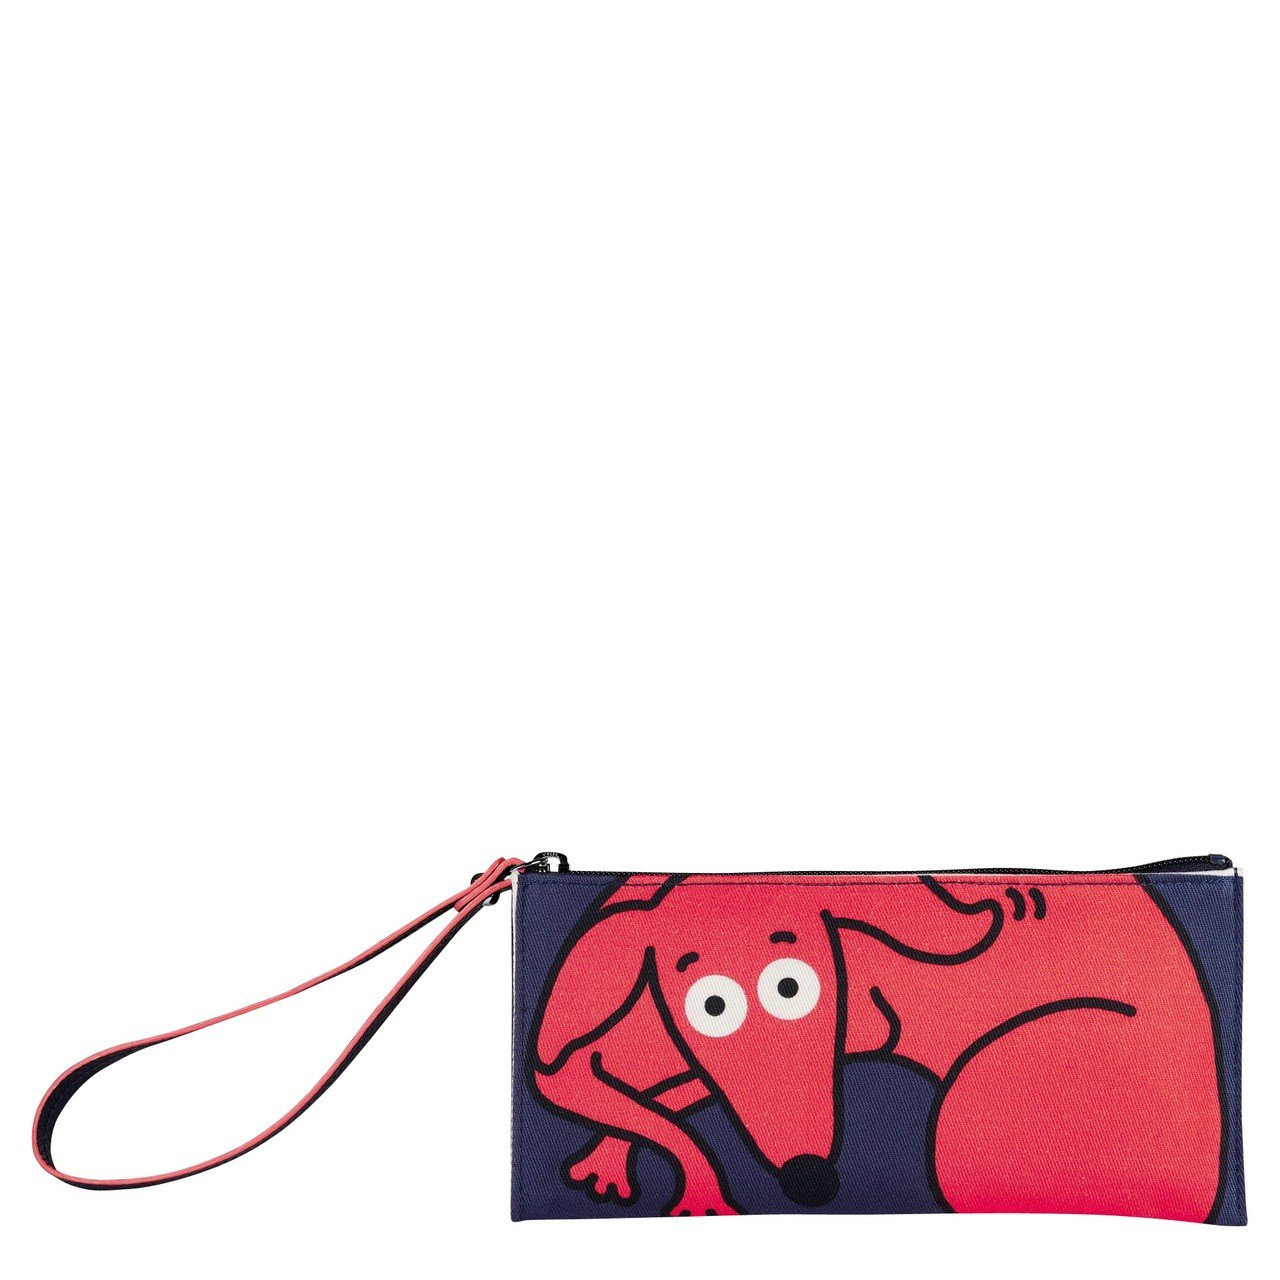 LONGCHAMP x Clo'e Floirat手拿包,售價2,300元_L2...